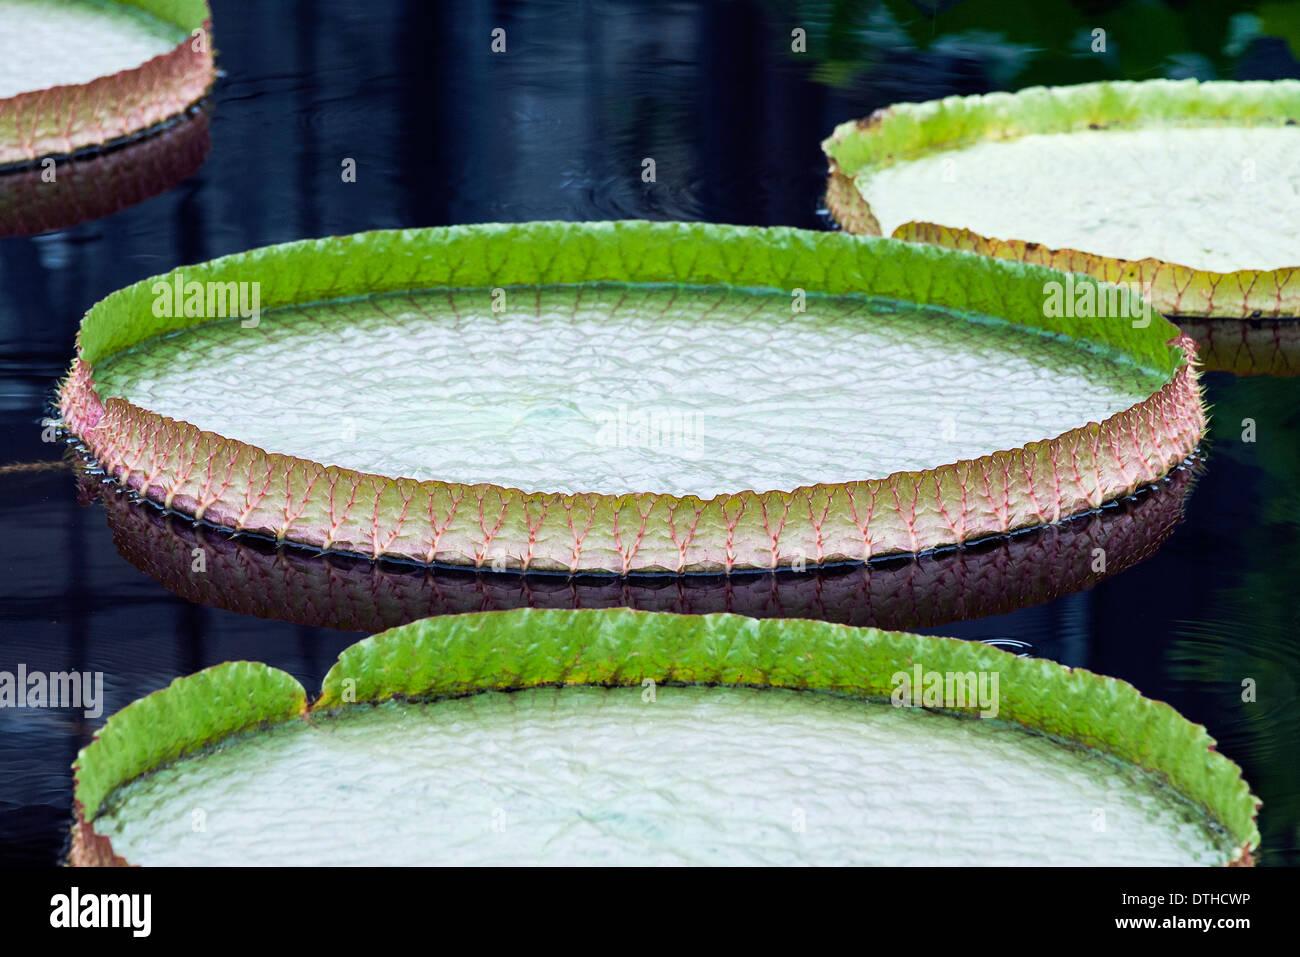 Agua gigante Lilly Pad Imagen De Stock